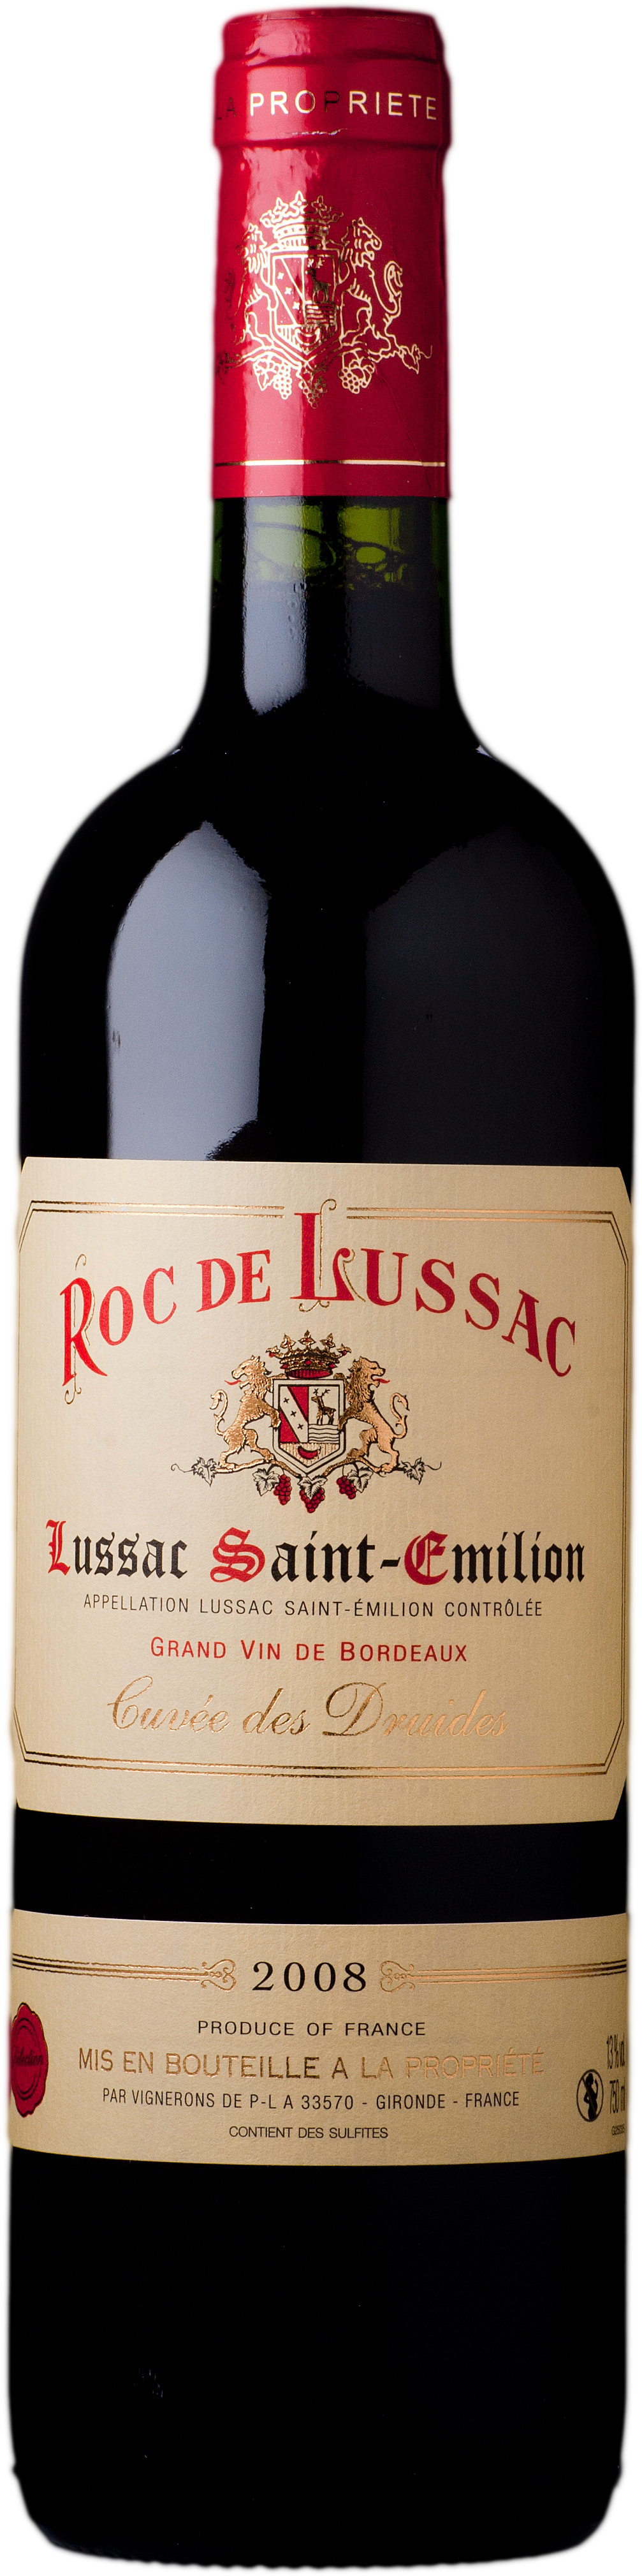 Roc De Lussac